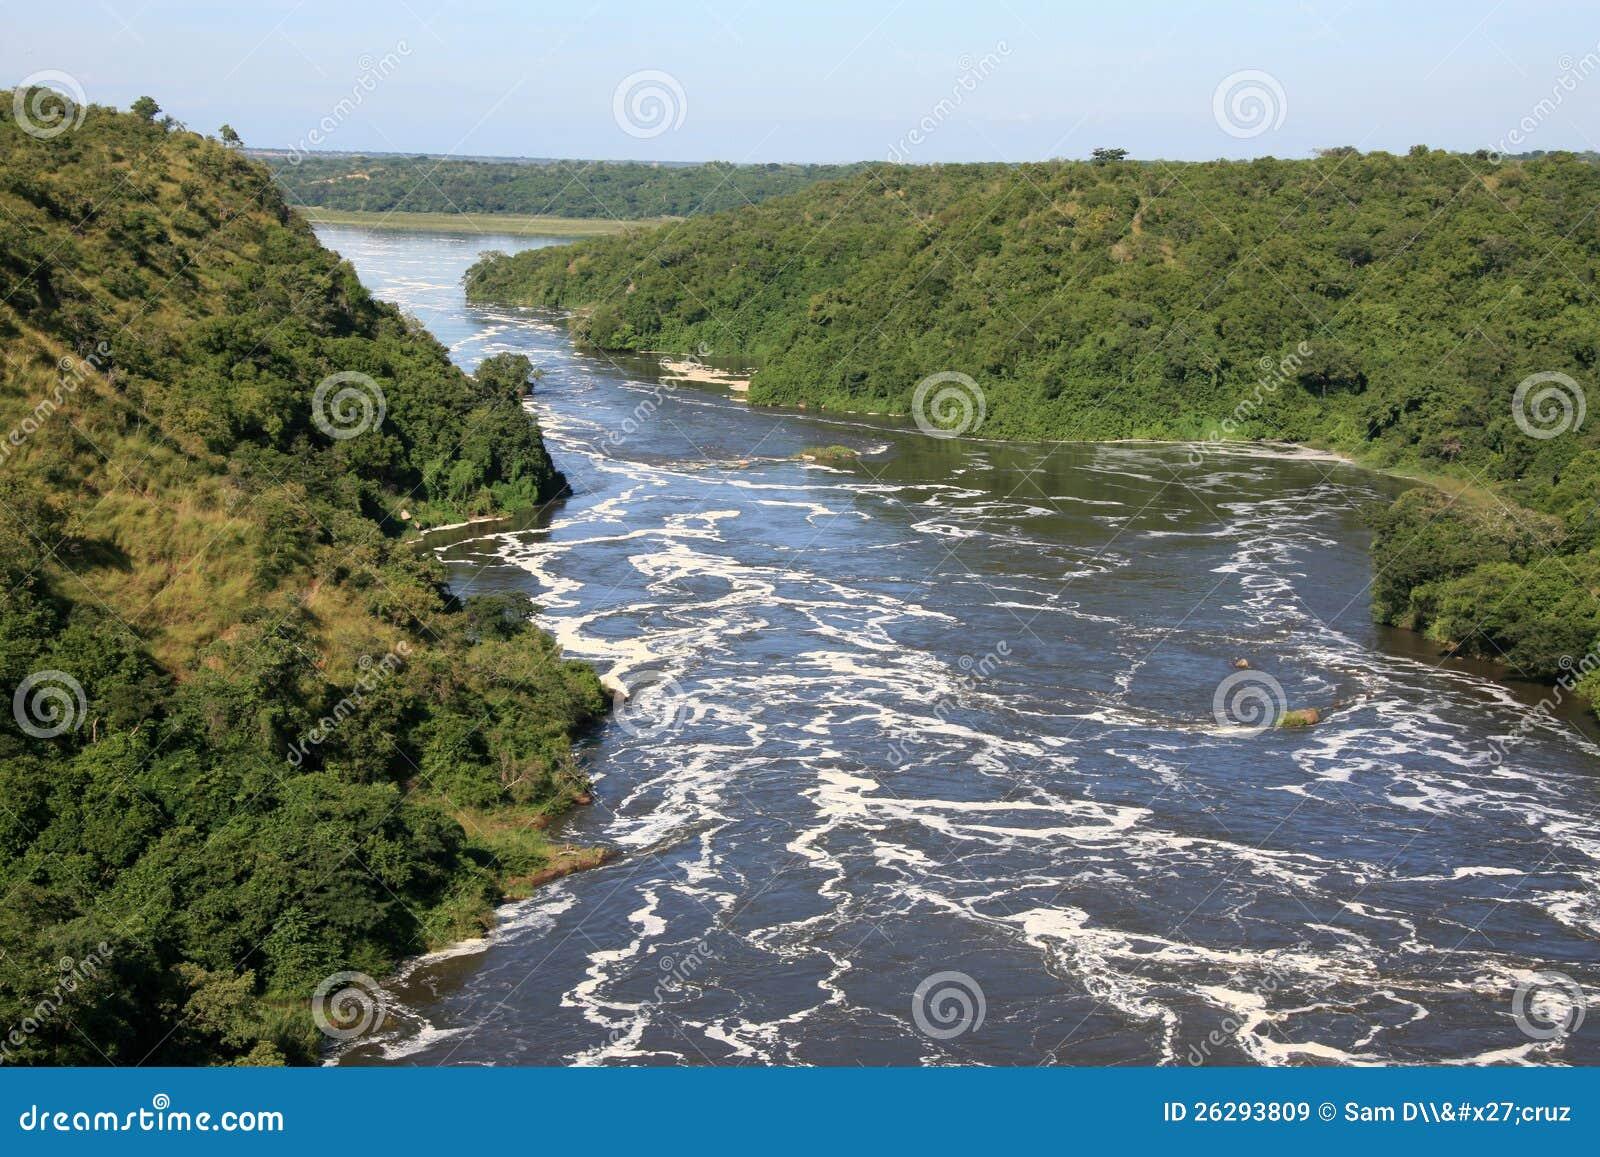 The Nile River Uganda Africa Royalty Free